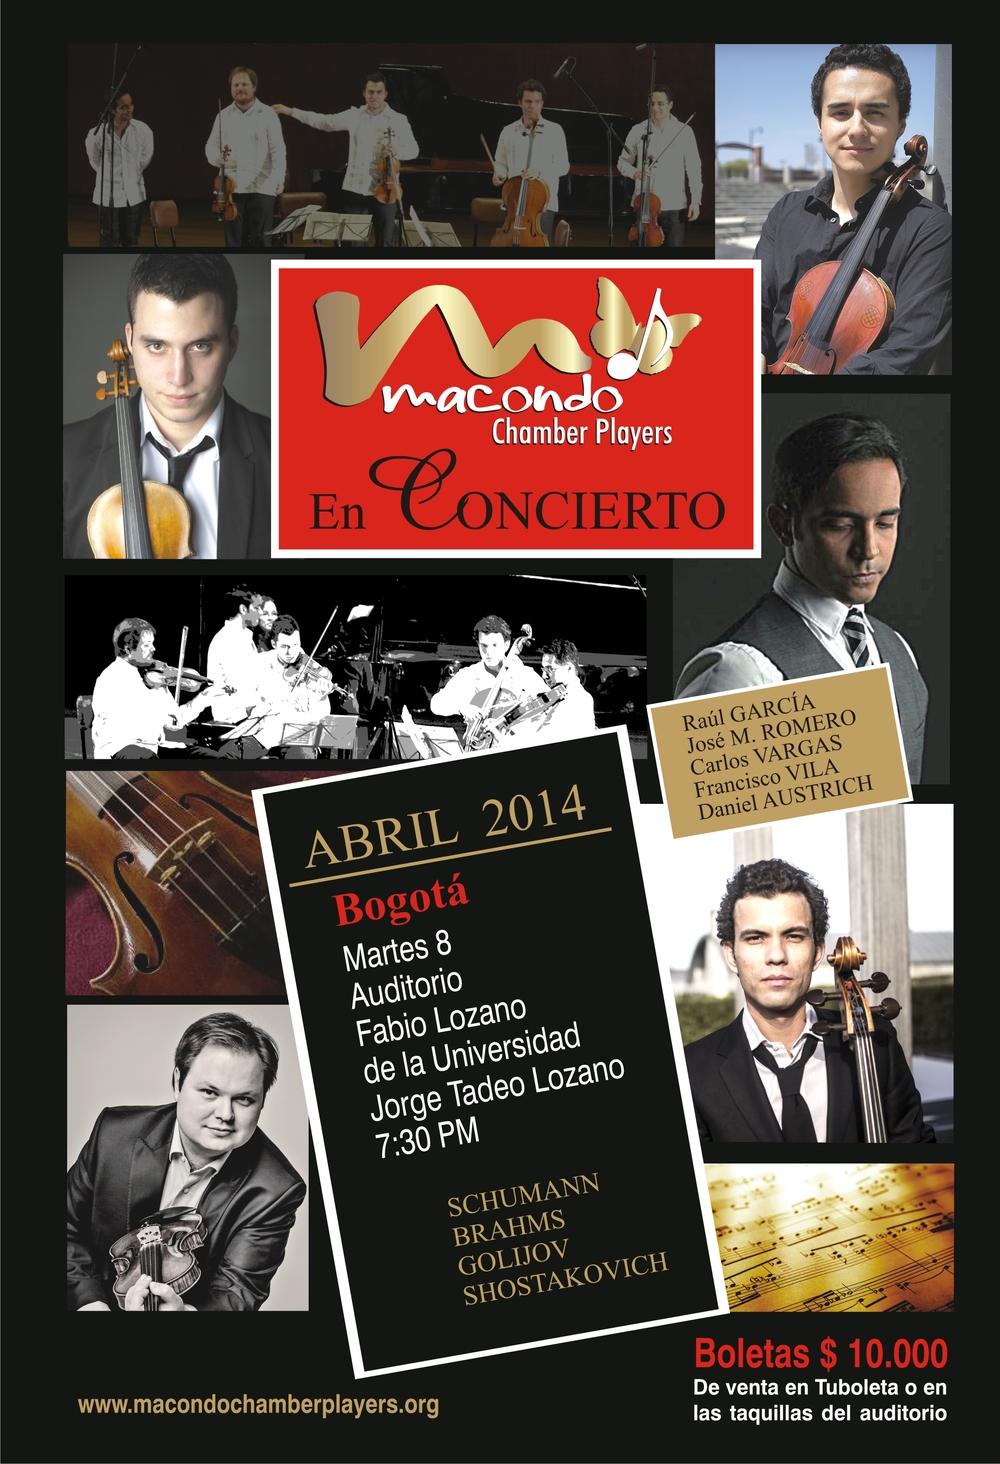 Afiche Bogotá Abril 8.jpg